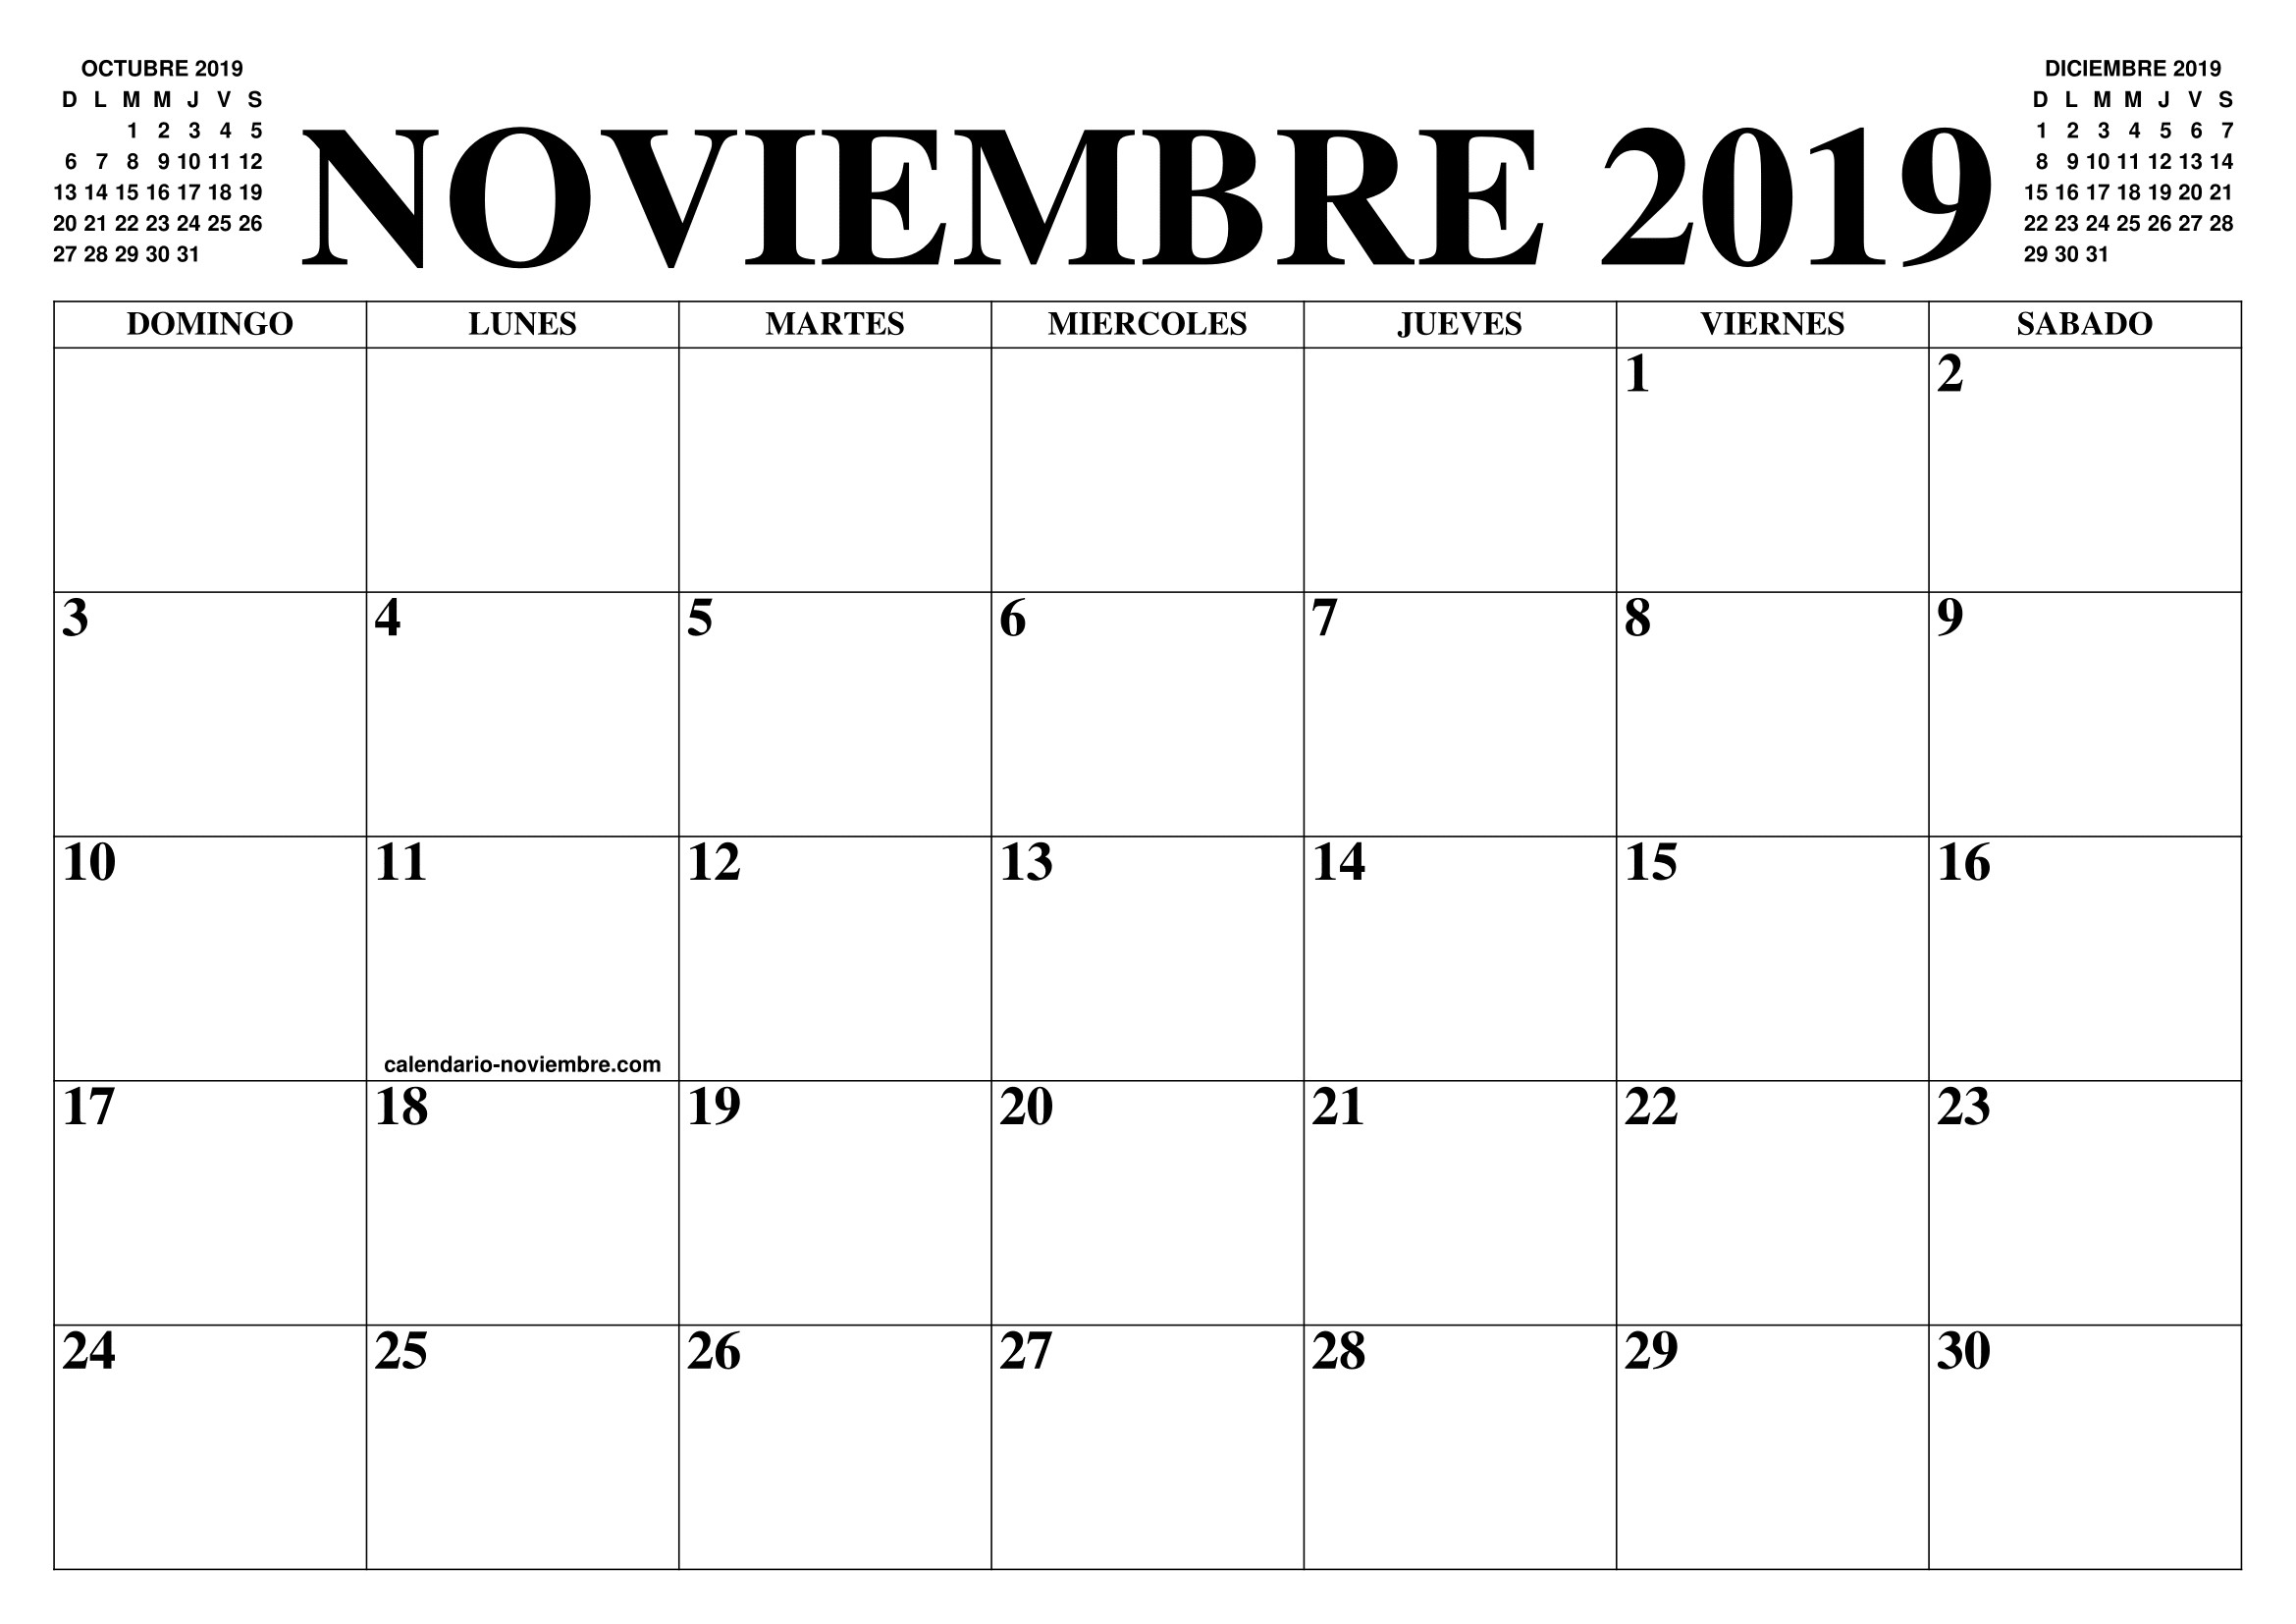 Calendario Noviembre 2019 El Calendario Noviembre 2019 Para